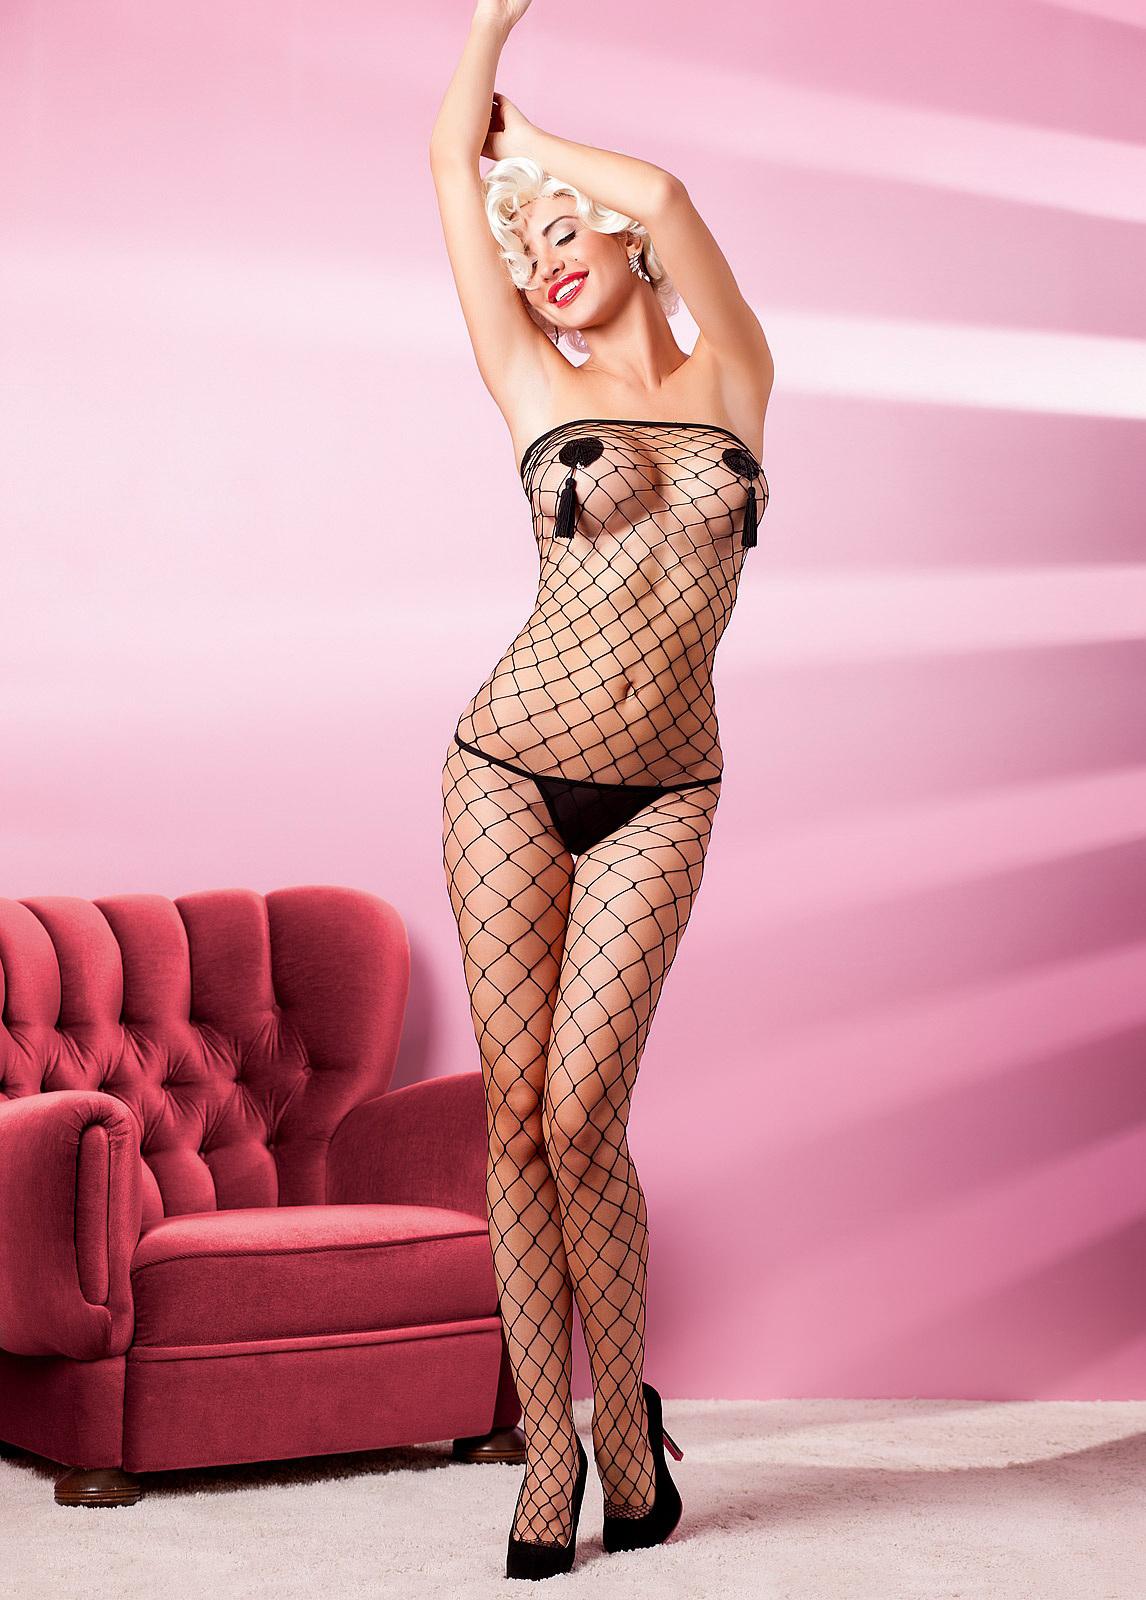 hot women wearing mesh lingerie - Monika Pietrasinska